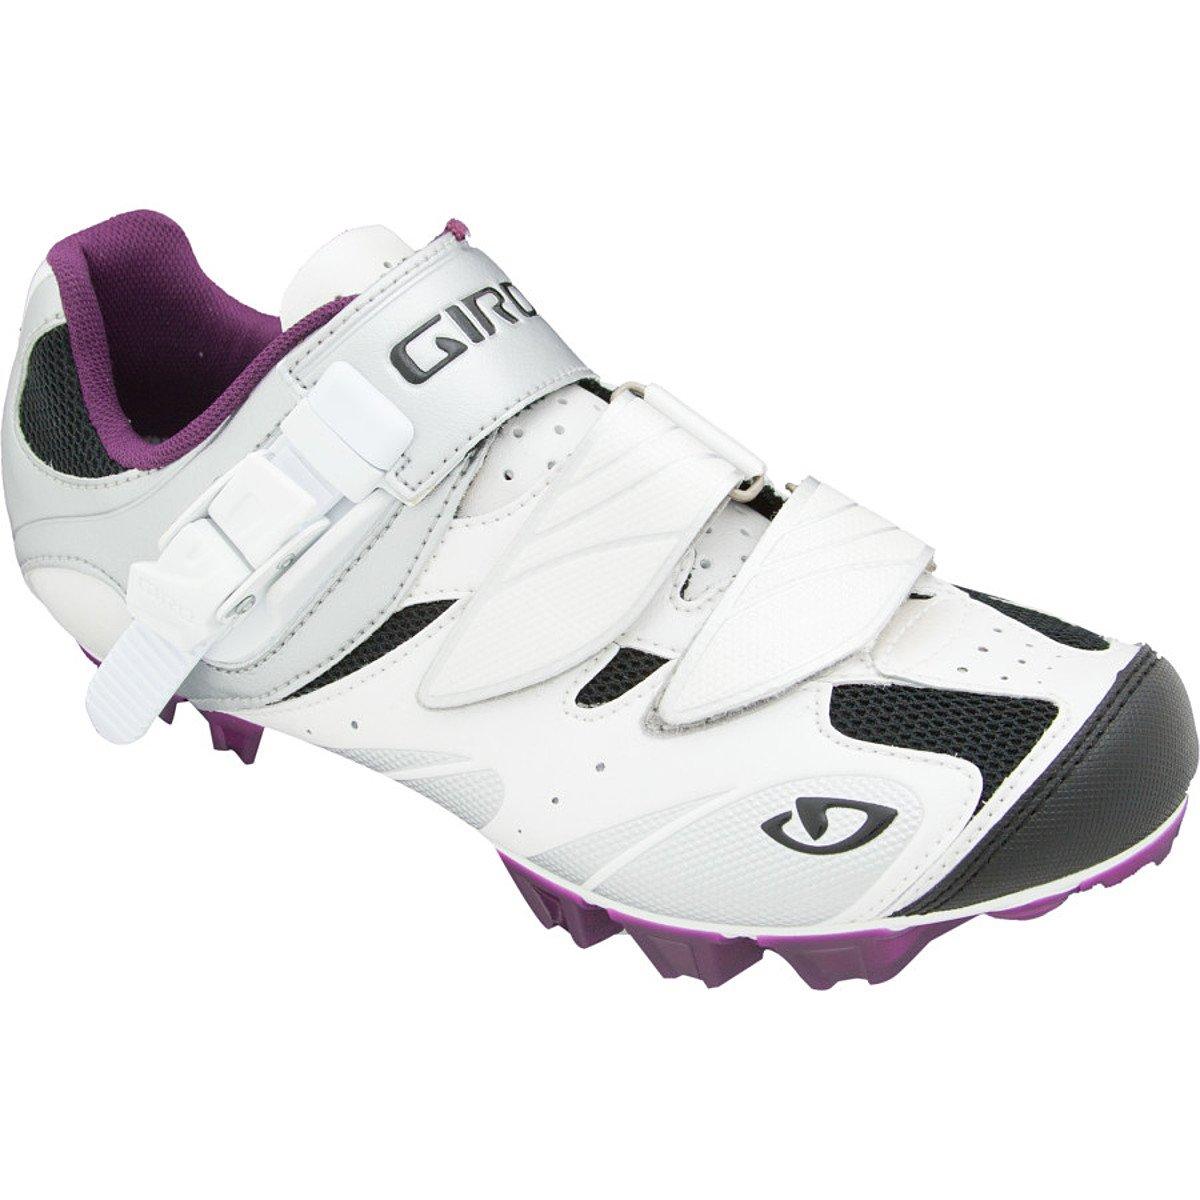 Giro Manta Bike Shoes Womens